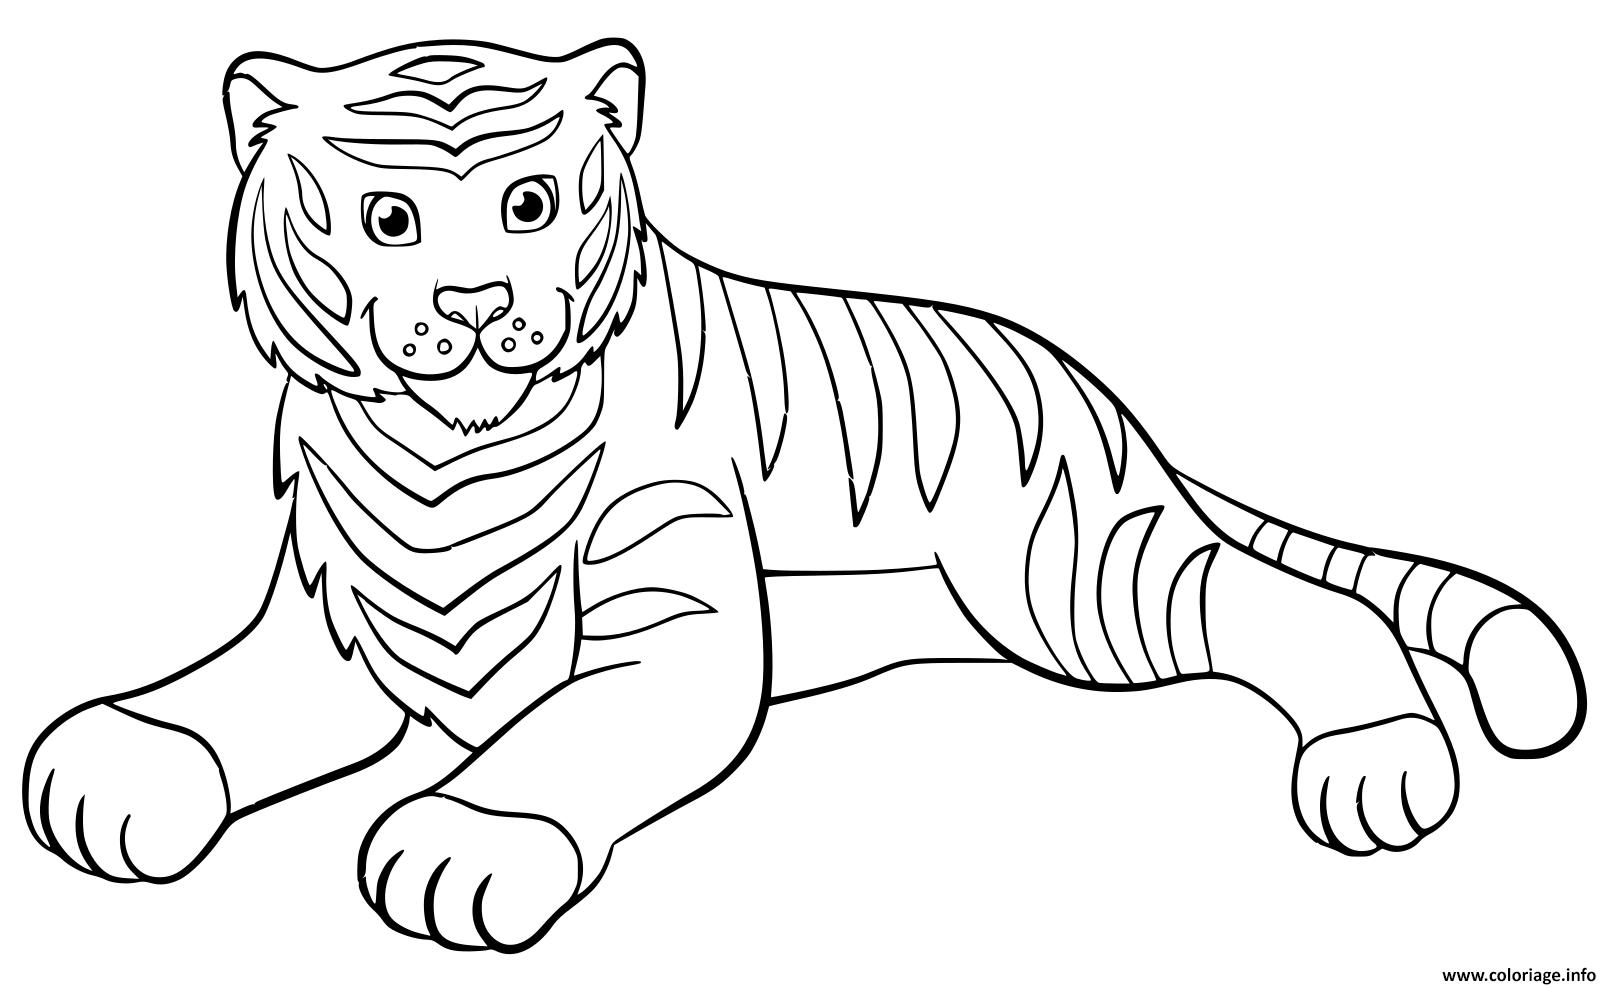 Dessin adorable tigre qui se repose Coloriage Gratuit à Imprimer